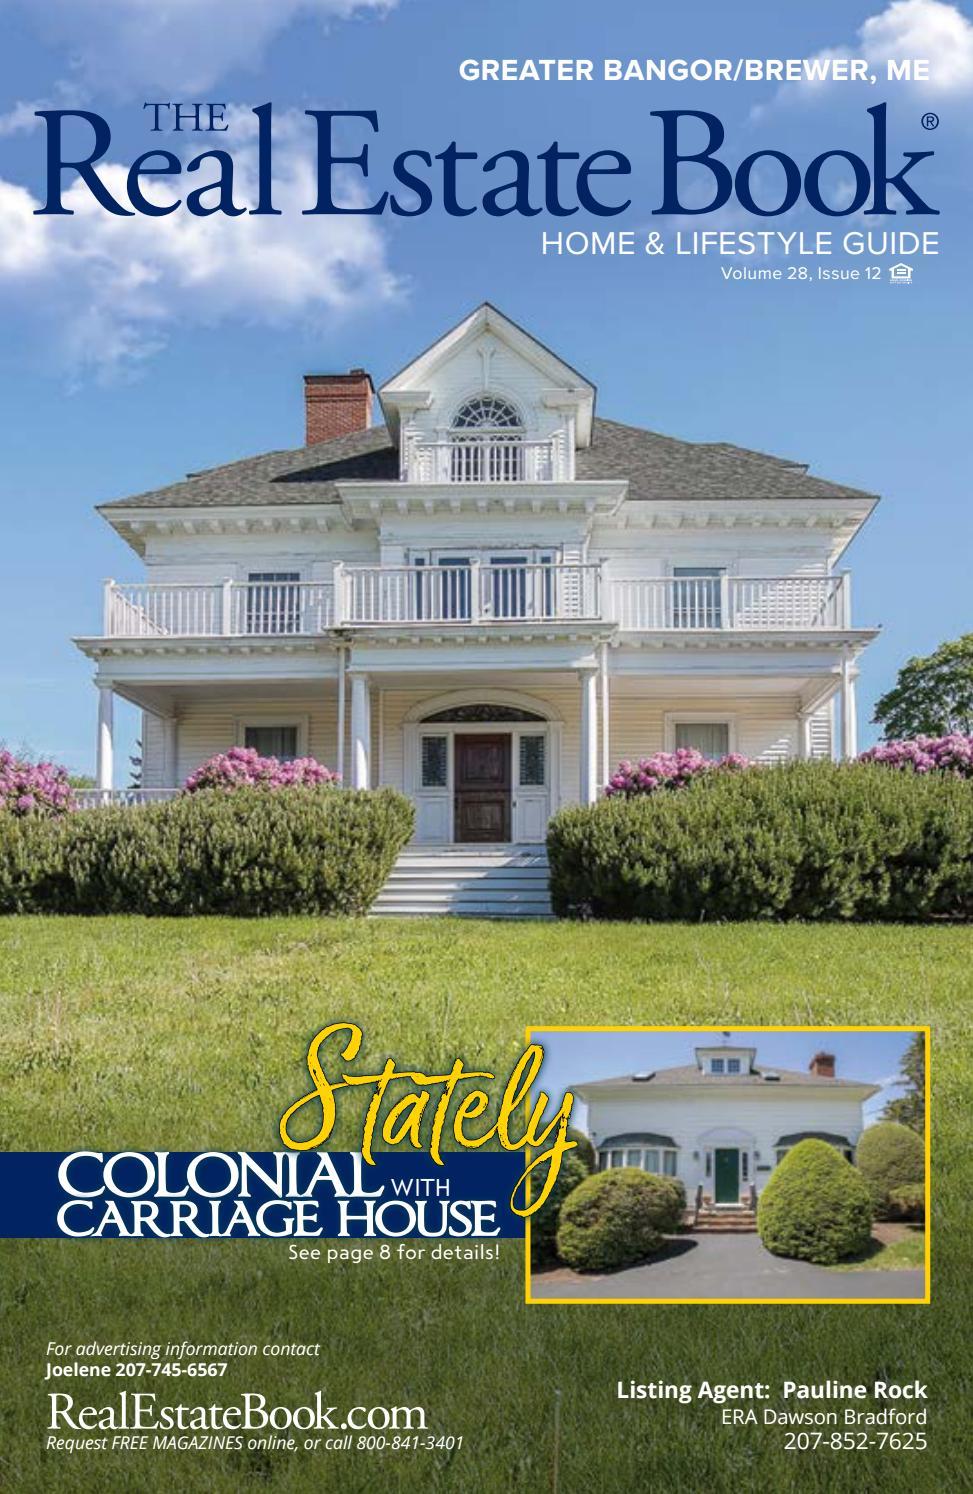 Real Estate Book Greater Bangor Maine